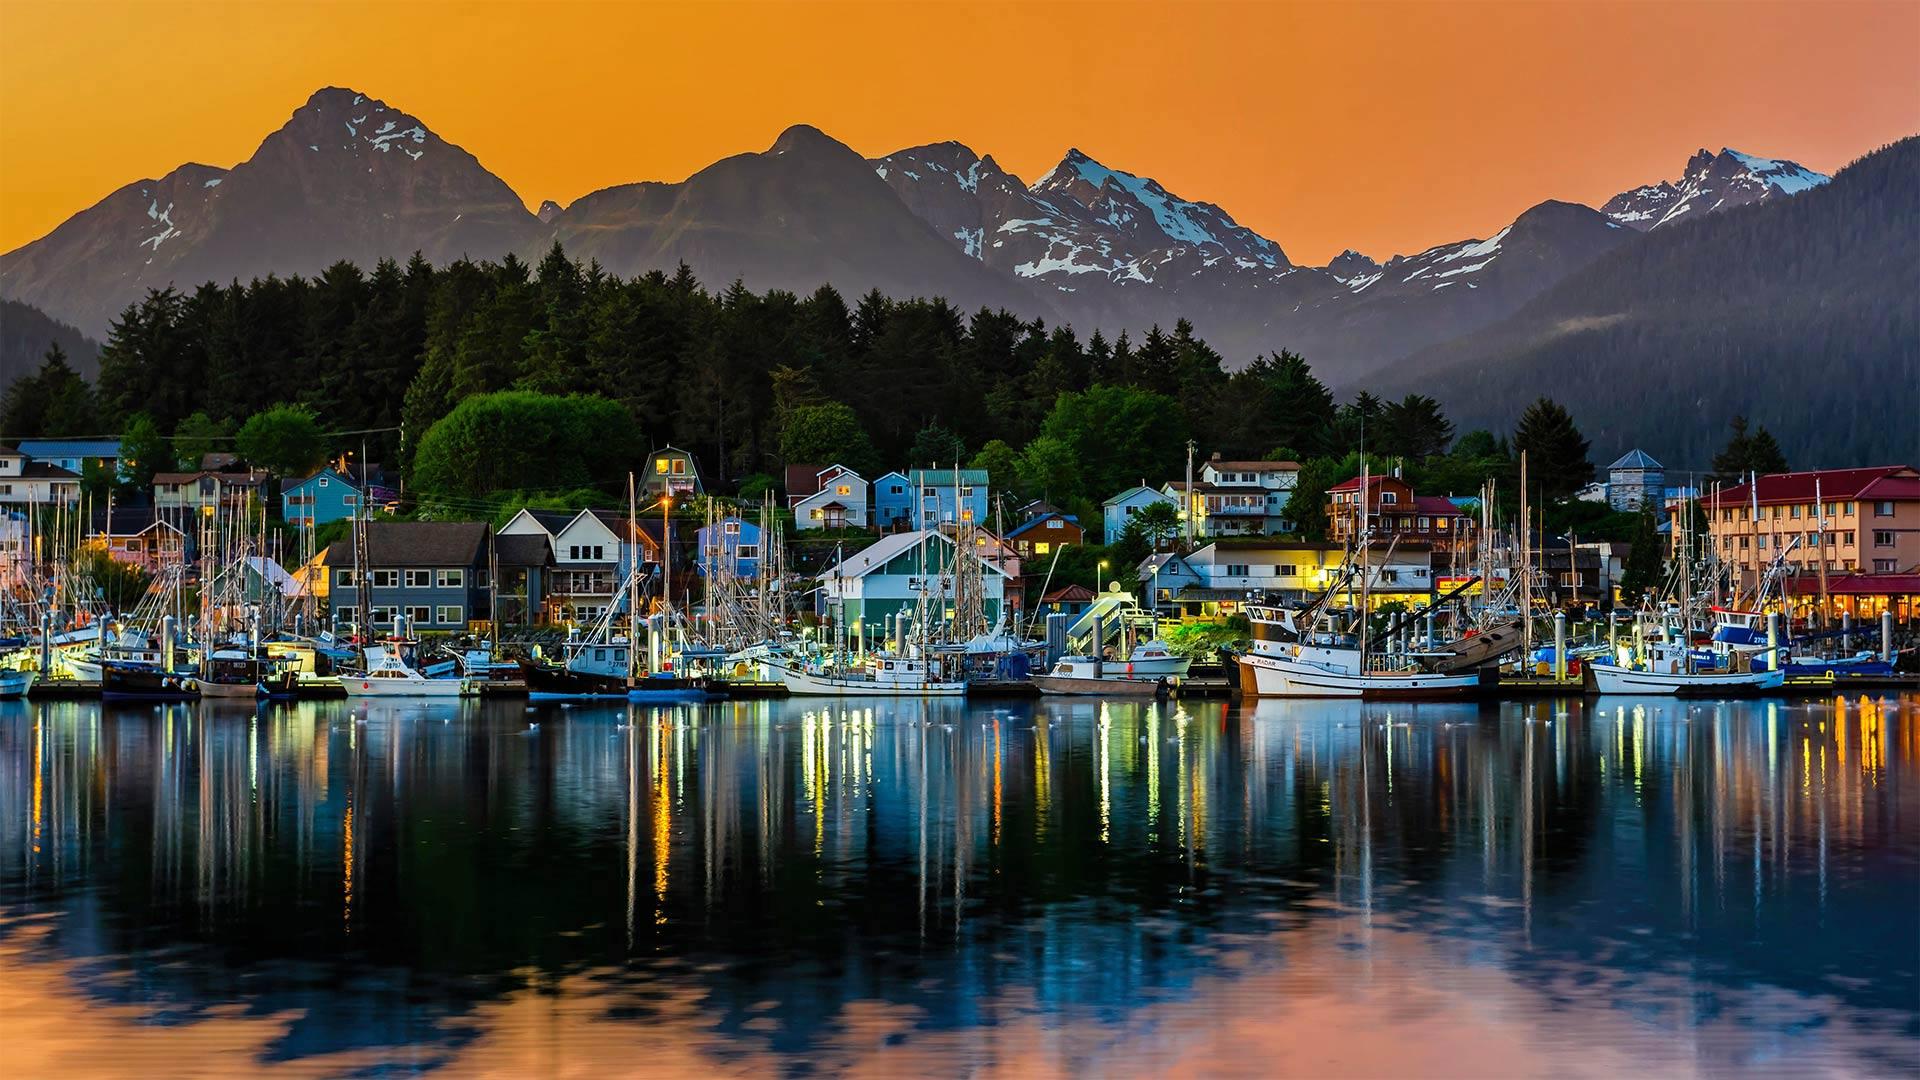 Harbor in Sitka, Alaska (© Blaine Harrington III/Alamy)